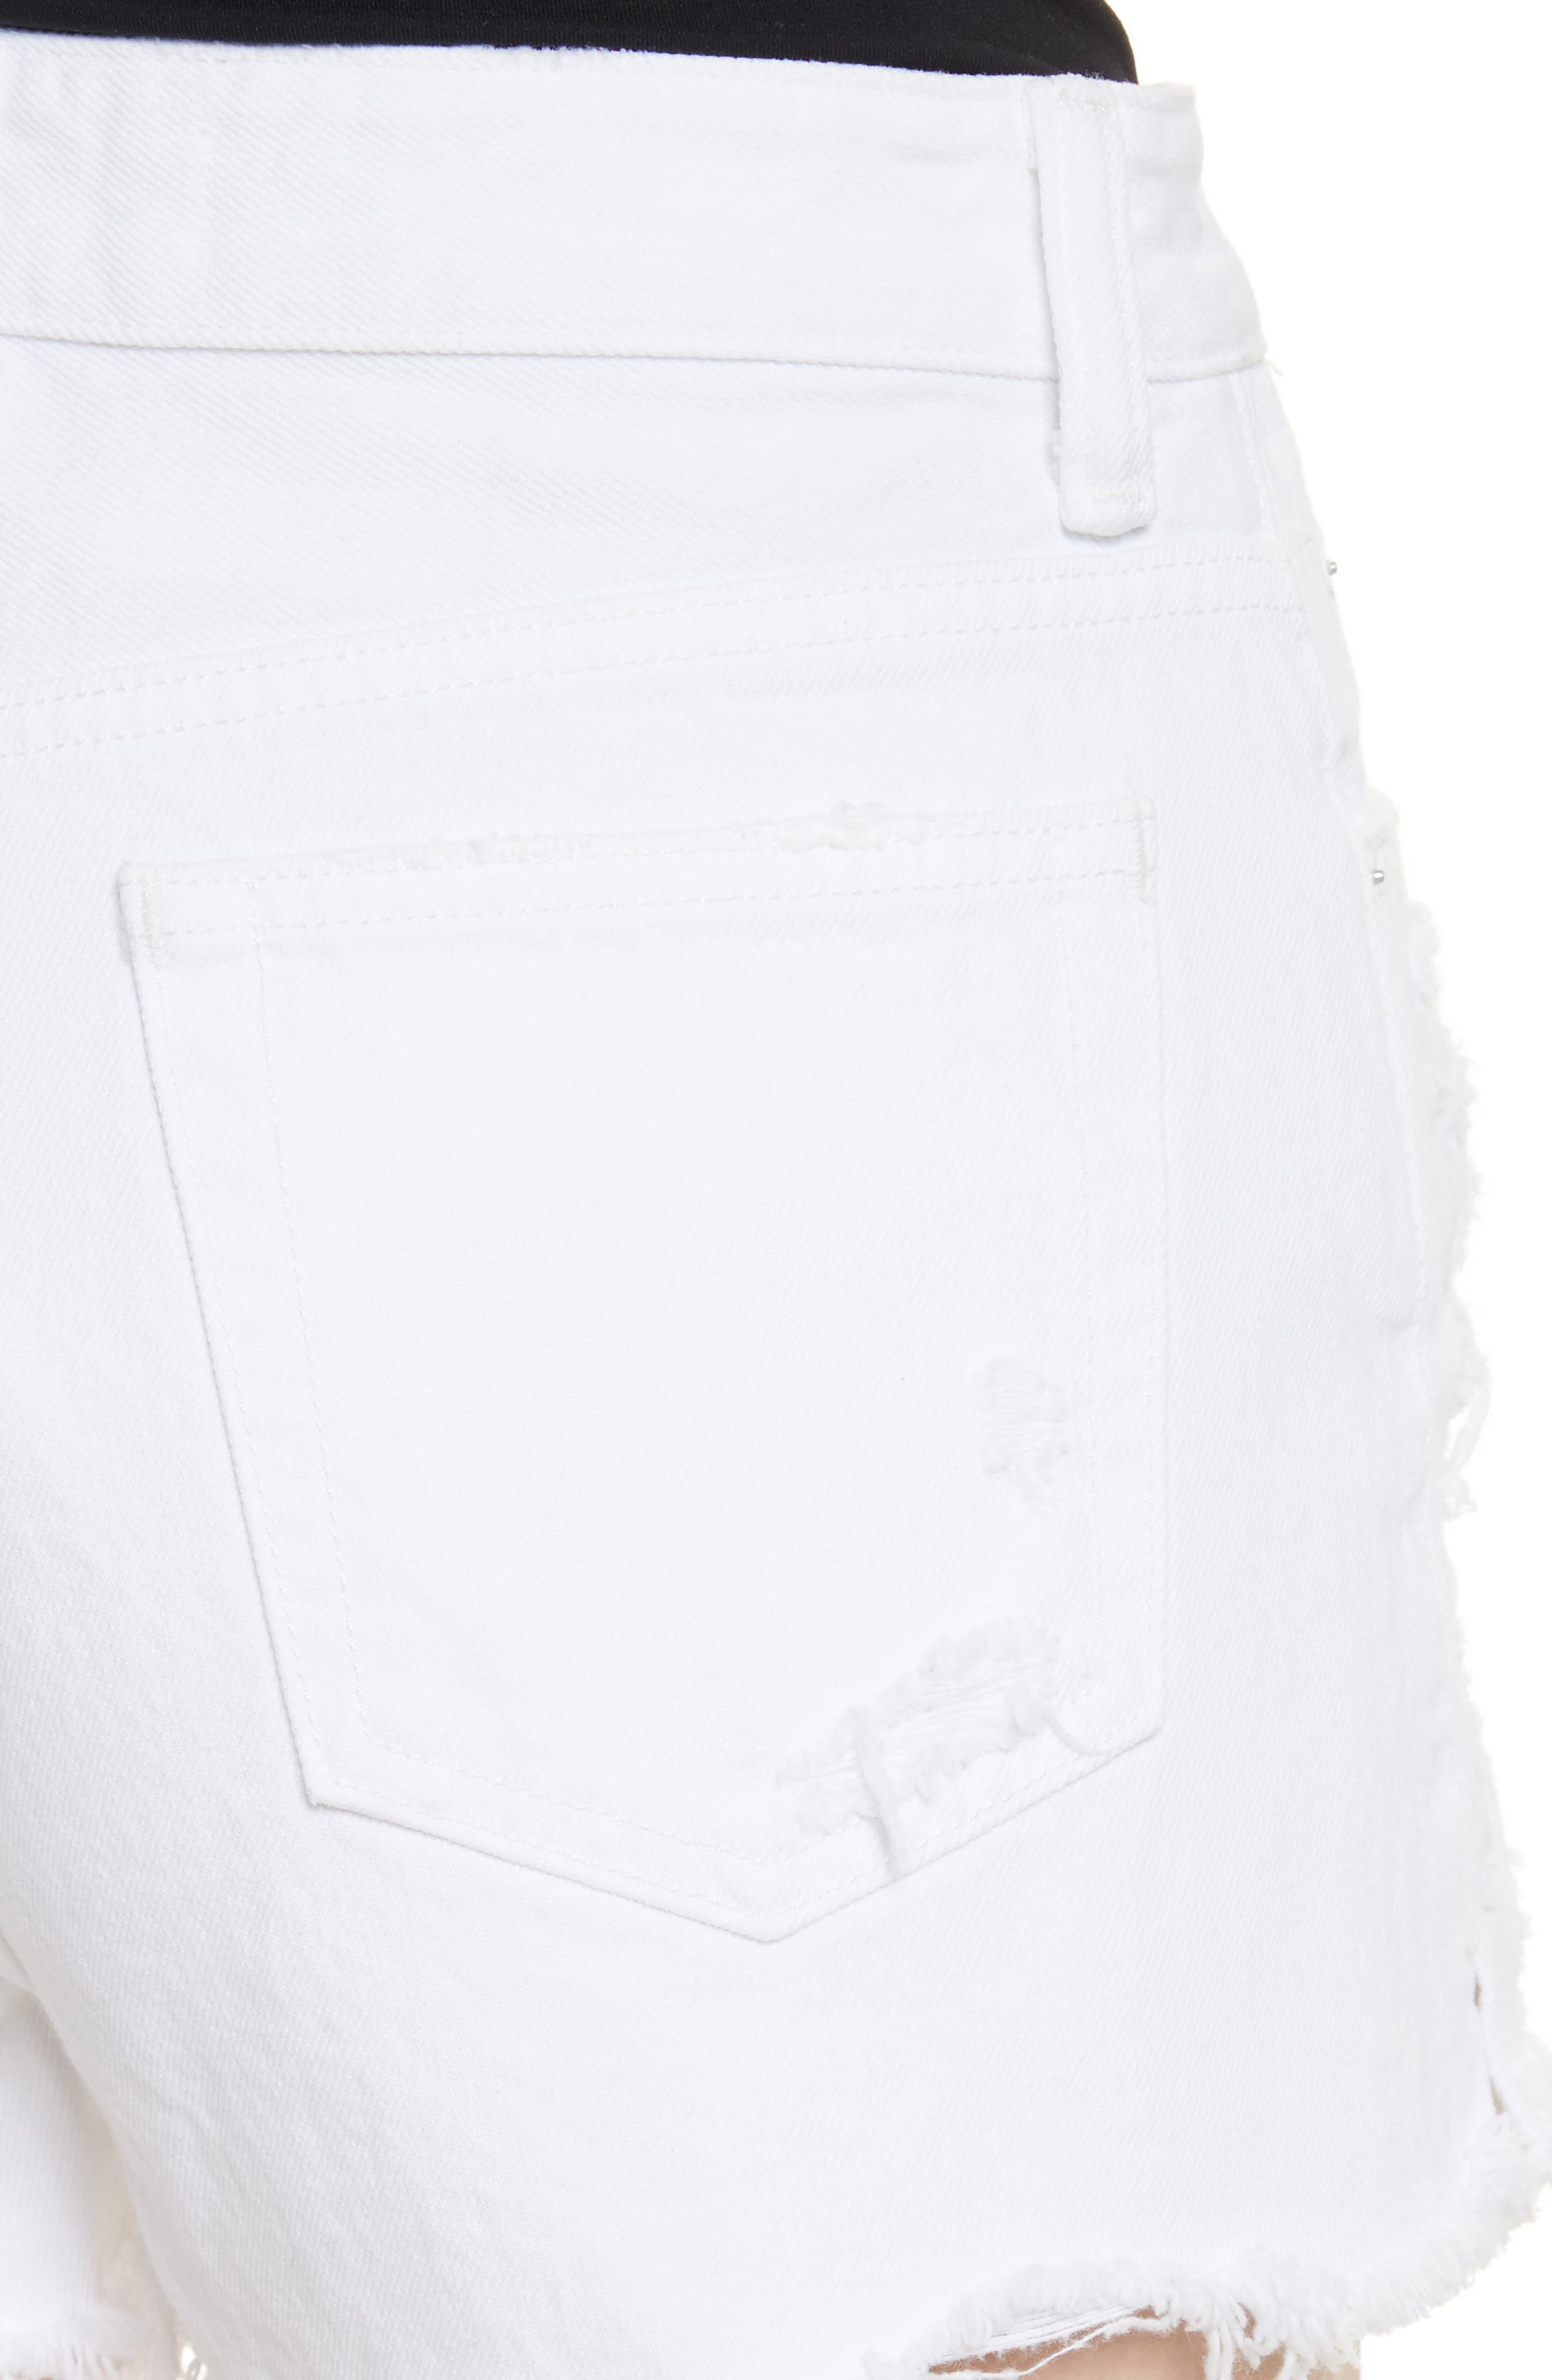 Bite White Ripped Denim Shorts,                             Alternate thumbnail 4, color,                             Bleached Destroy